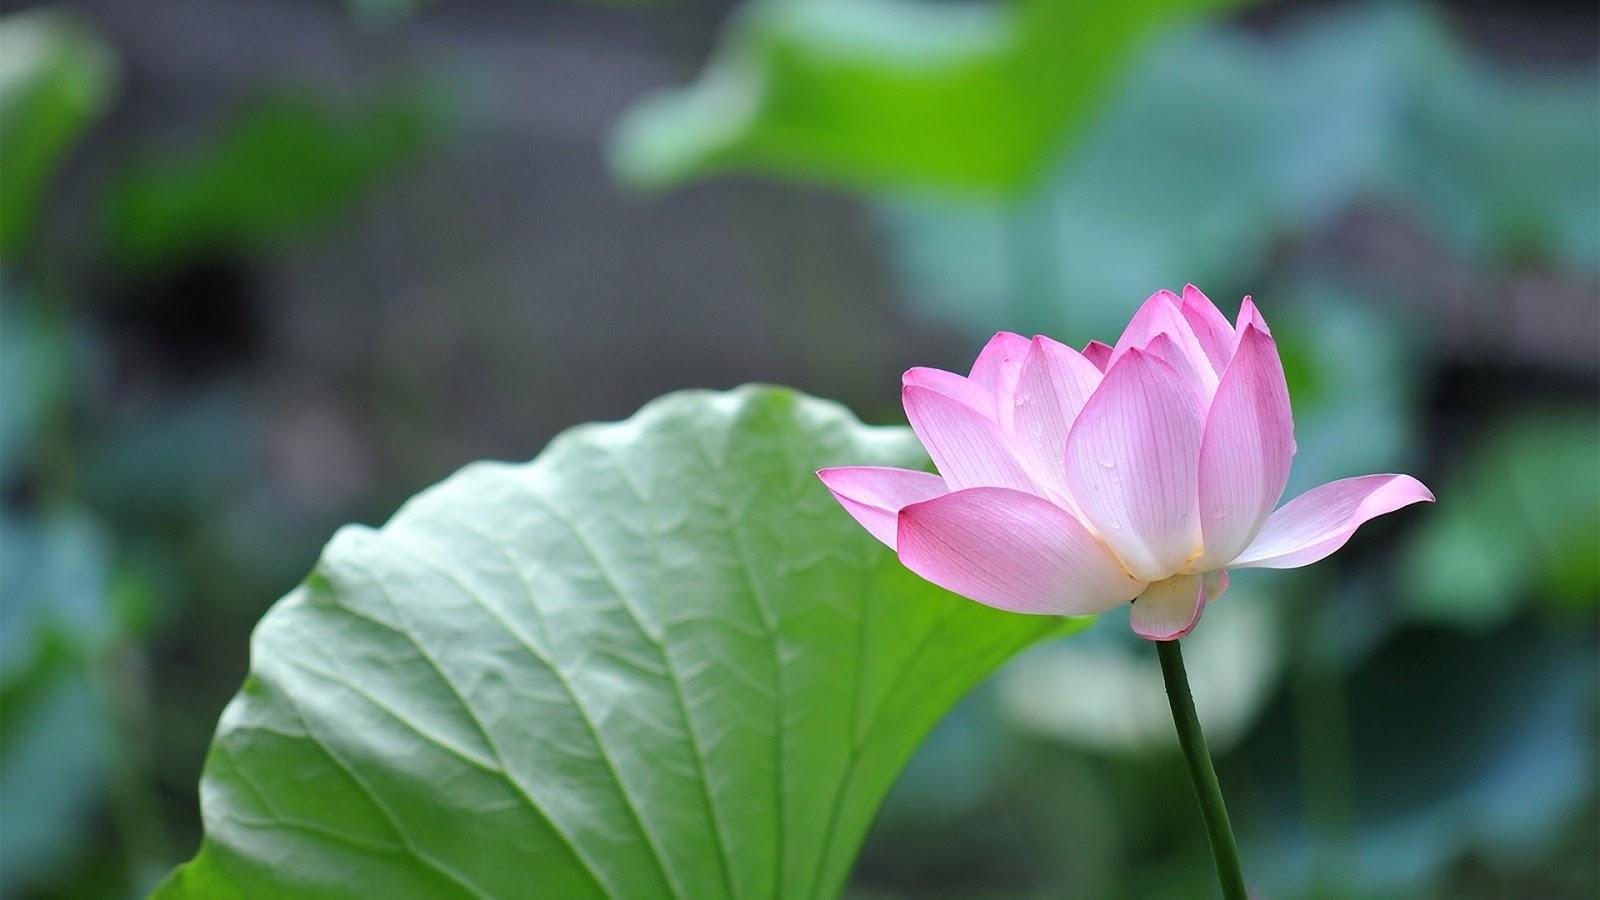 Lotus Flower Mystery Wallpaper